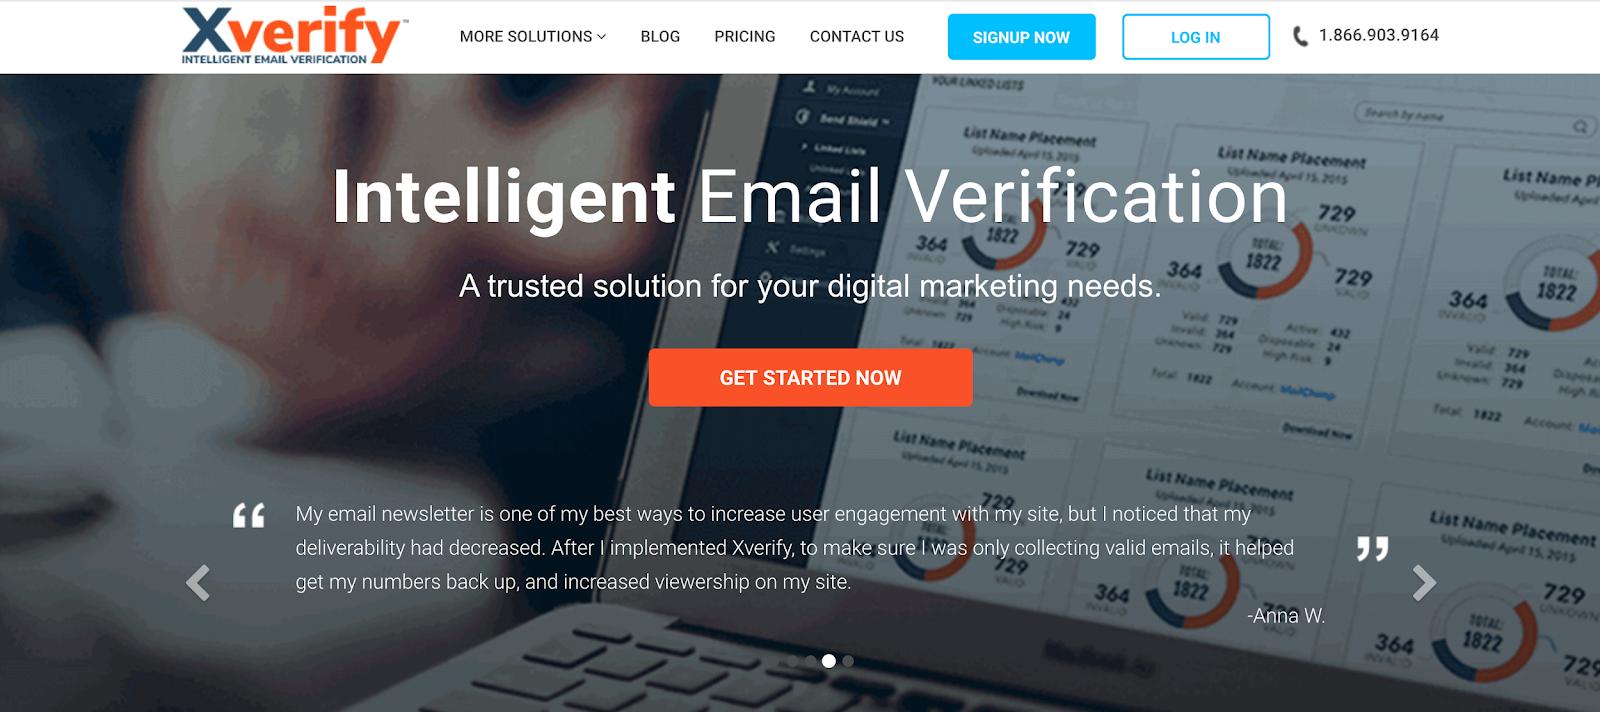 XVerify intelligent email verification